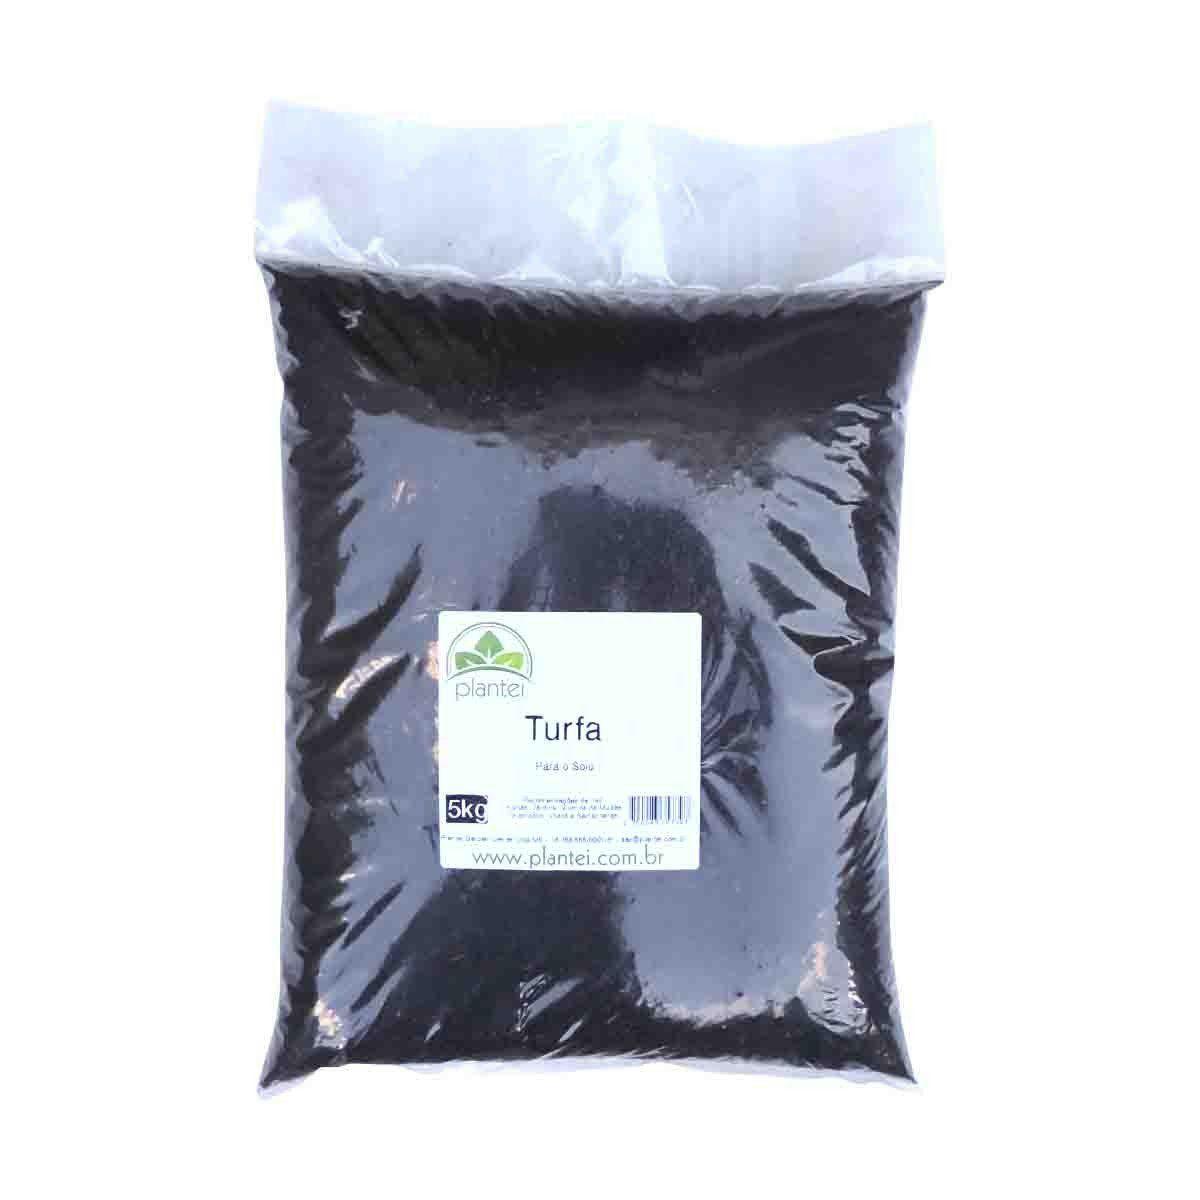 Turfa 5kg - Plantei